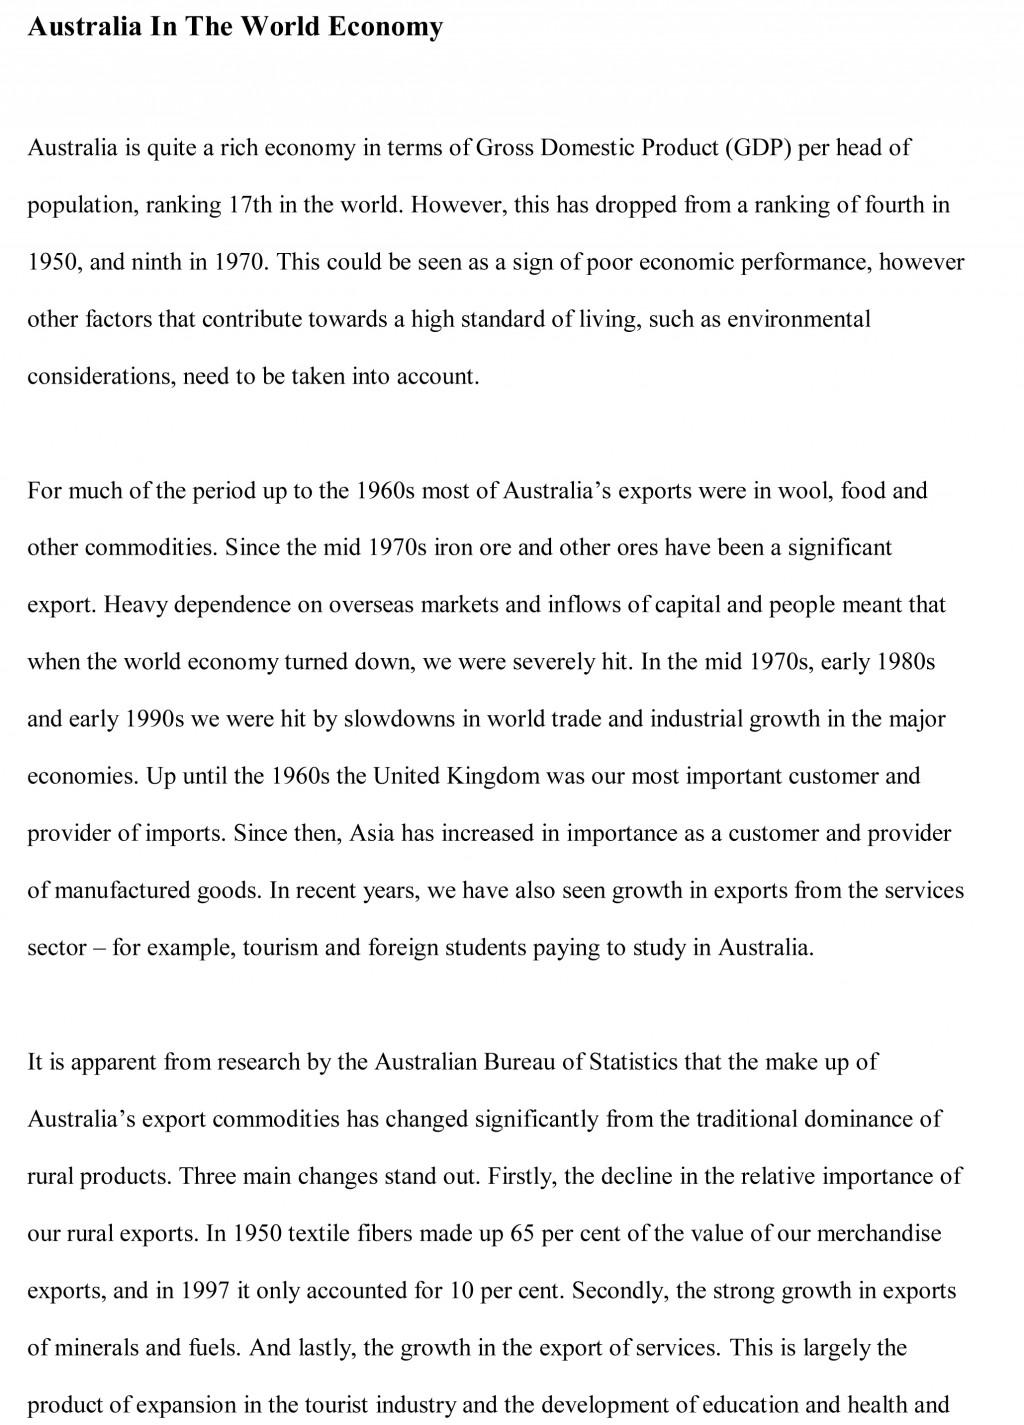 020 Essay Proofreader Free Economics Sample Incredible Online Large